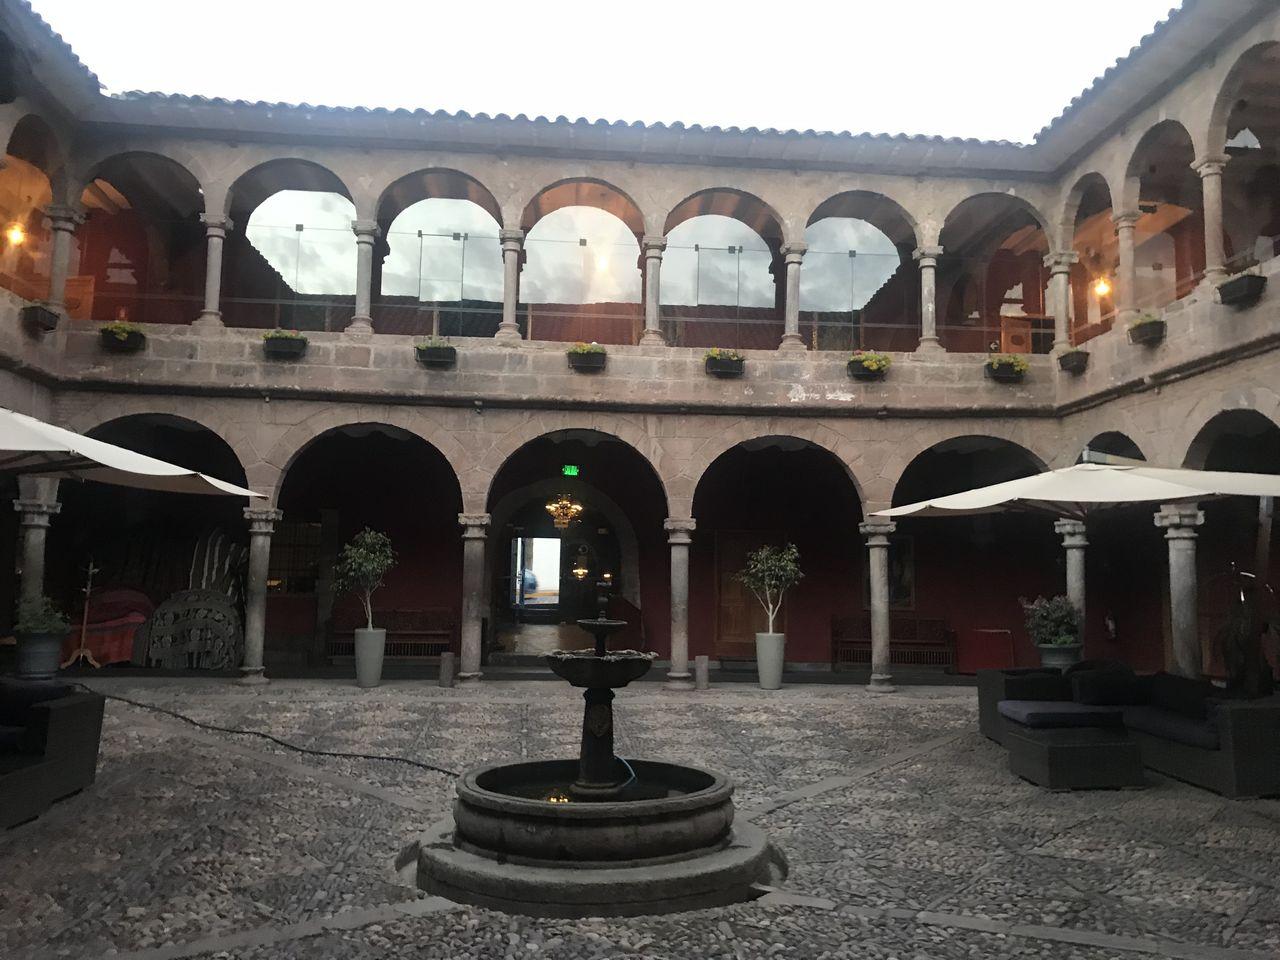 Hotel courtyard at dawn